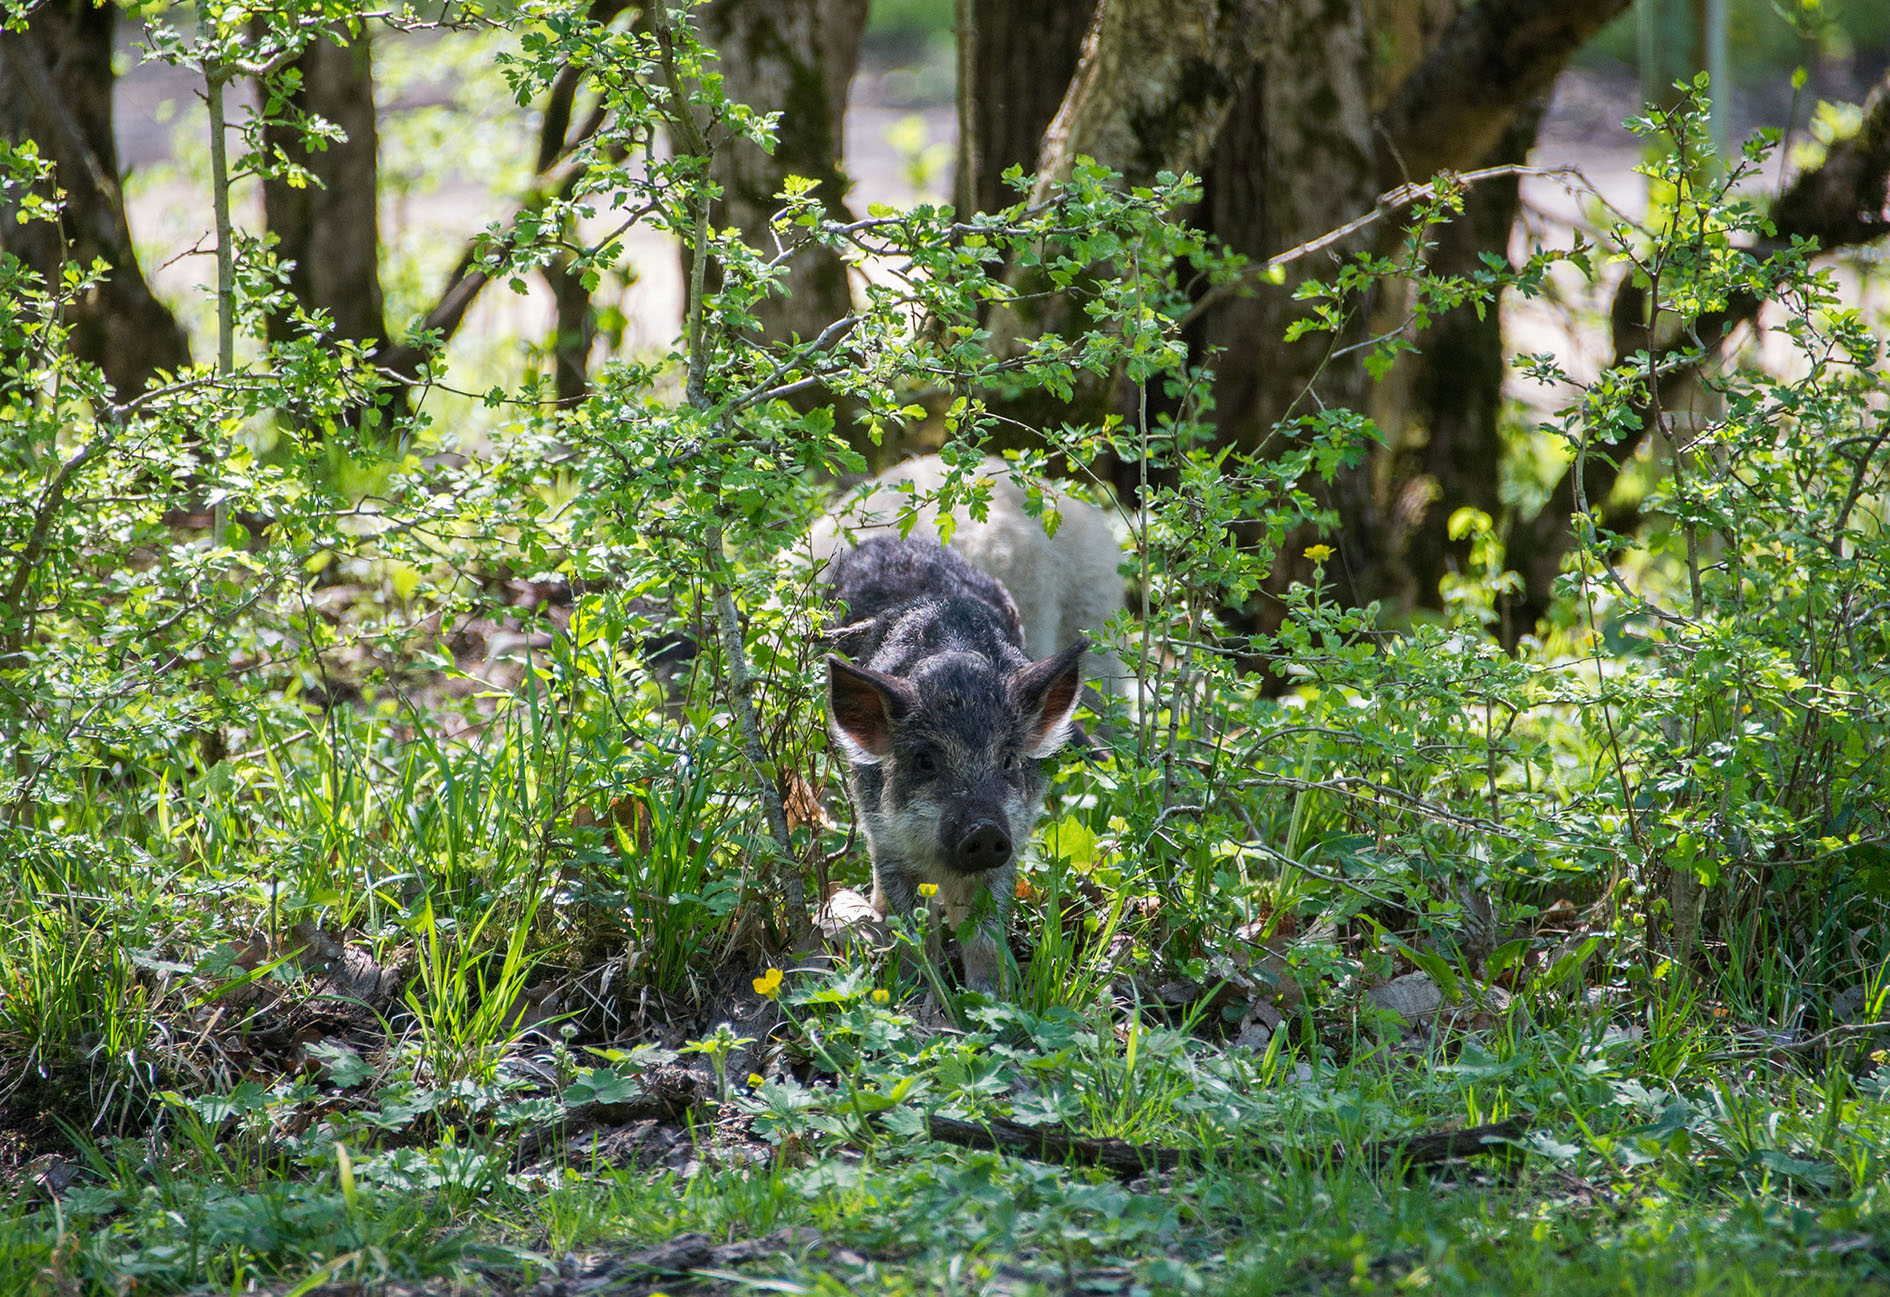 alderhill_piglet_oak woods.jpg